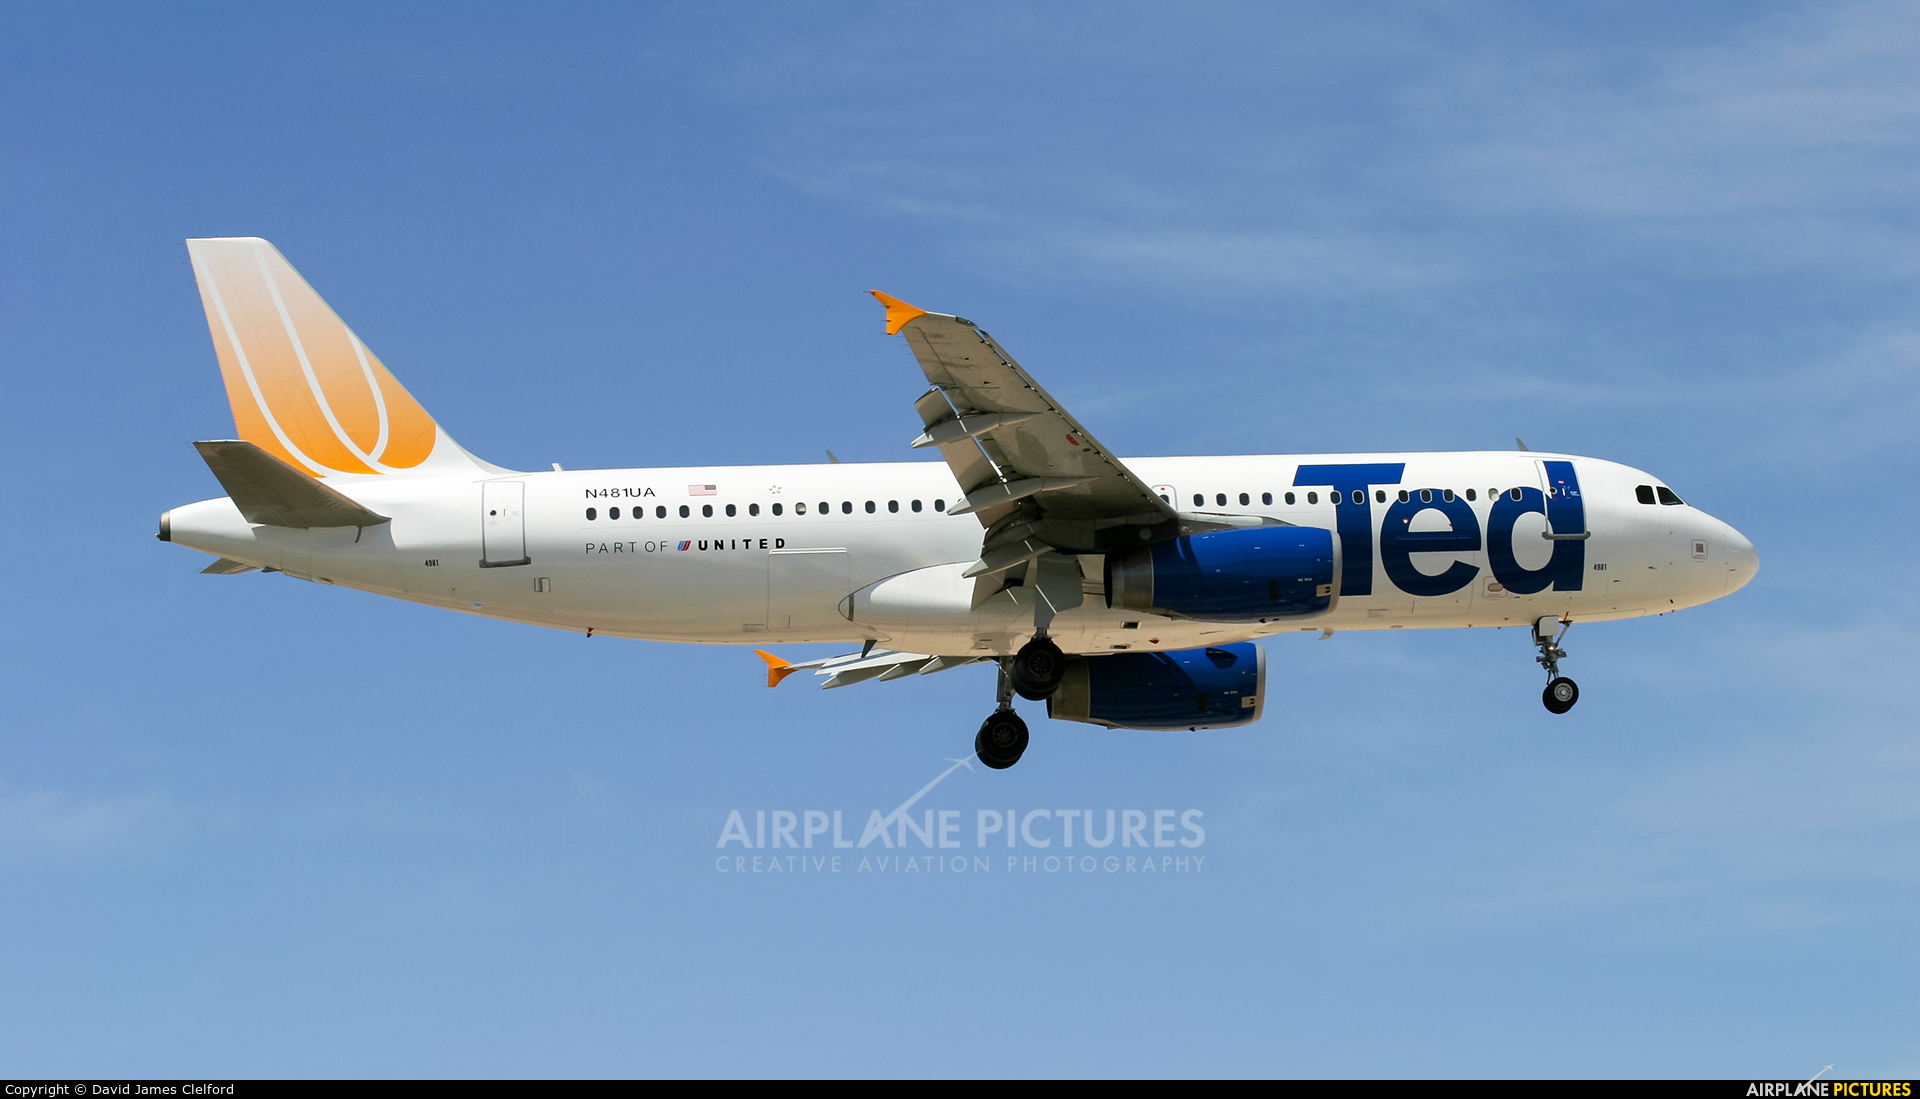 Ted N481UA aircraft at Las Vegas - McCarran Intl